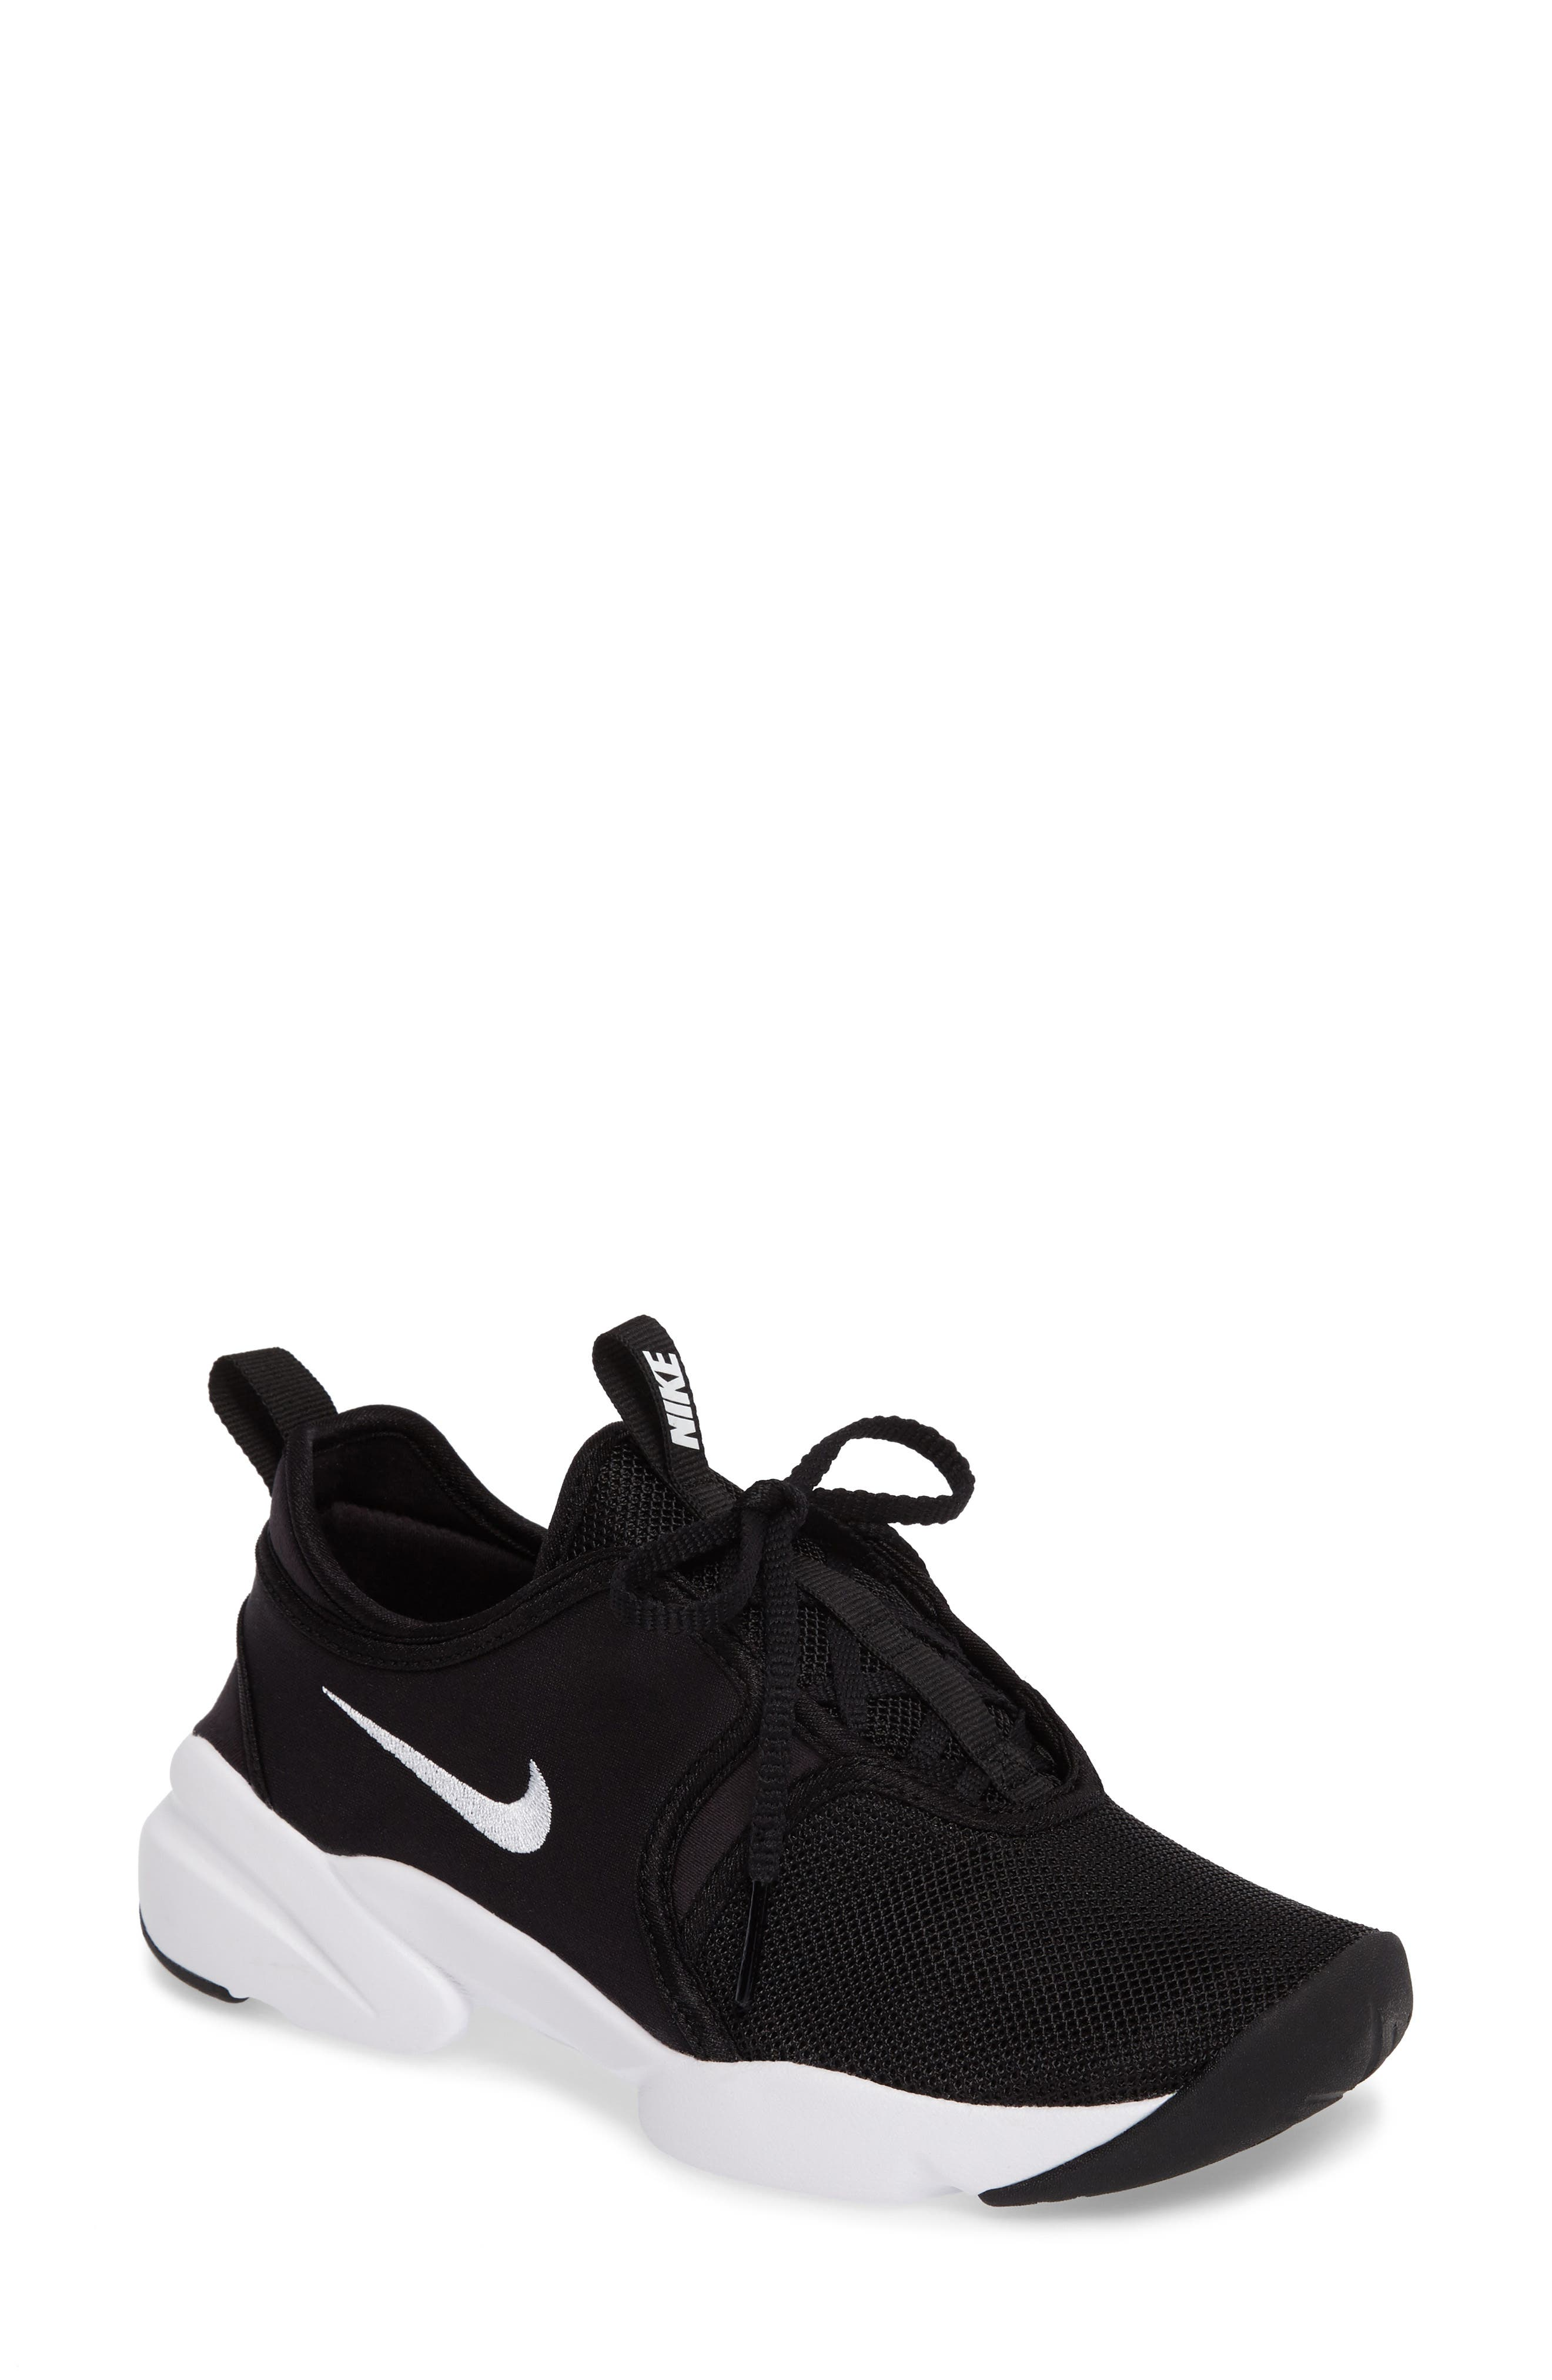 Loden Sneaker,                             Main thumbnail 1, color,